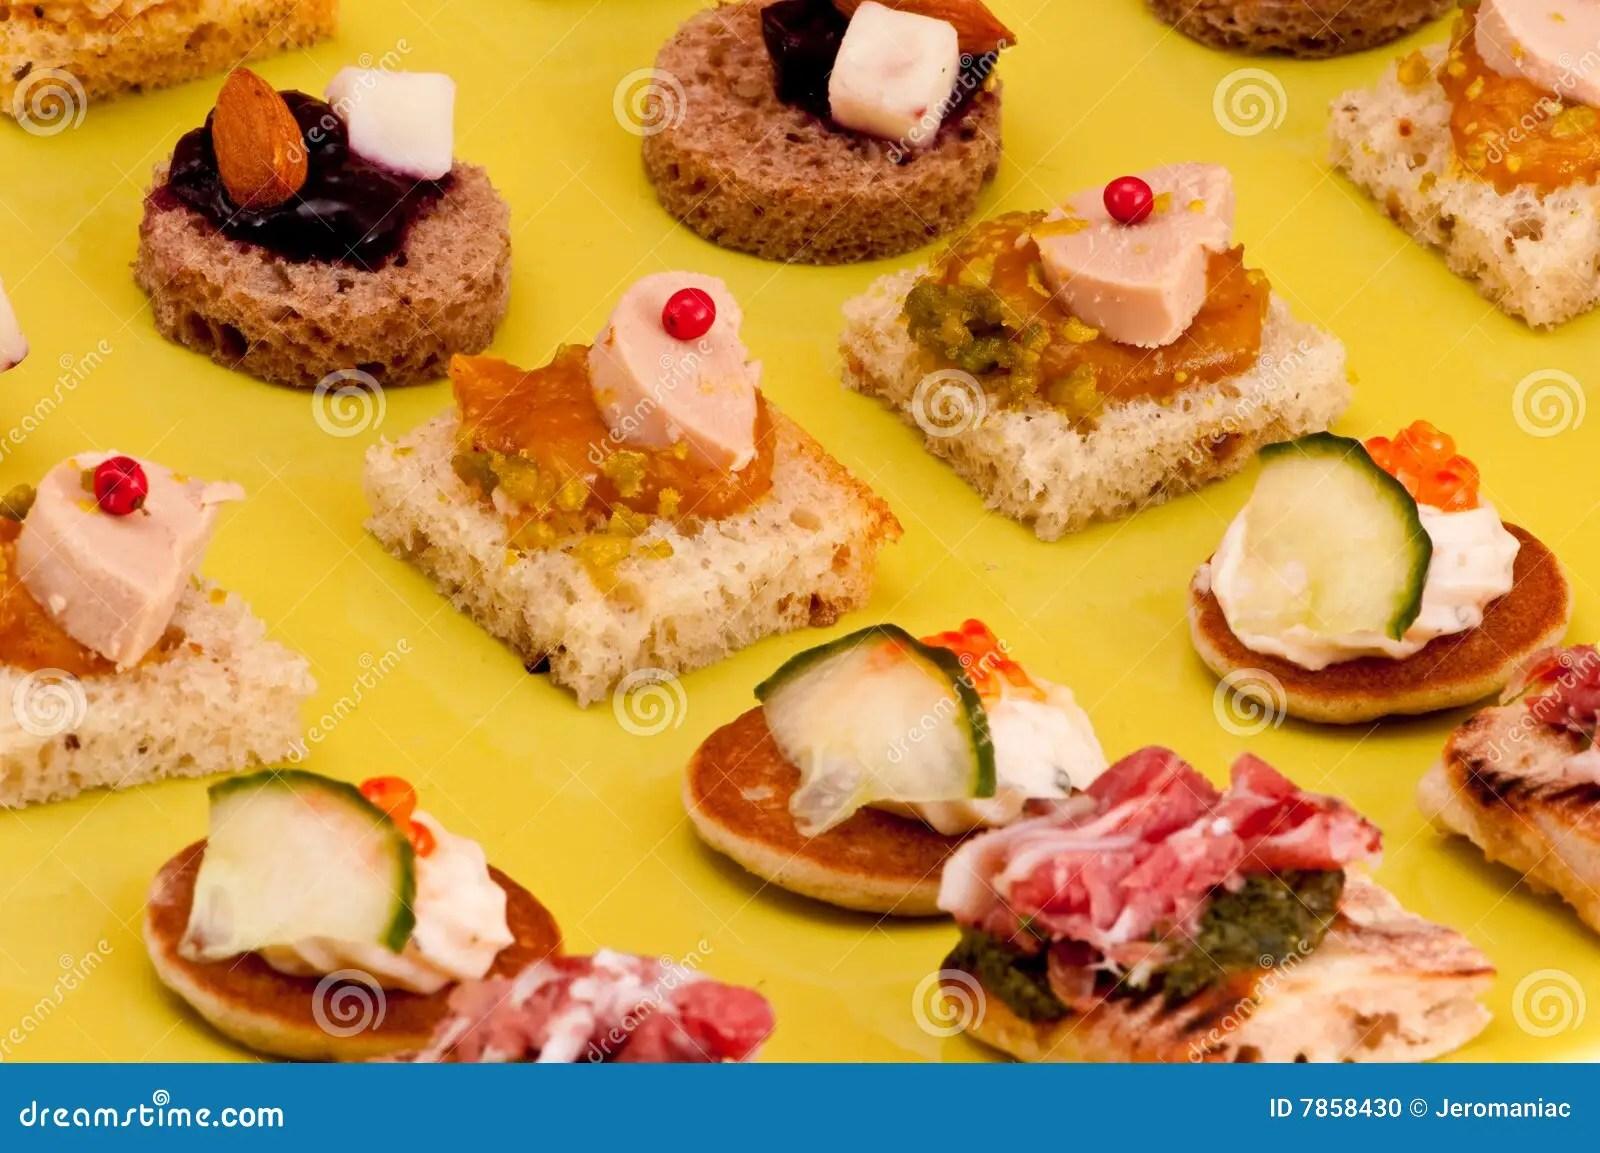 France Appetizer Recipes